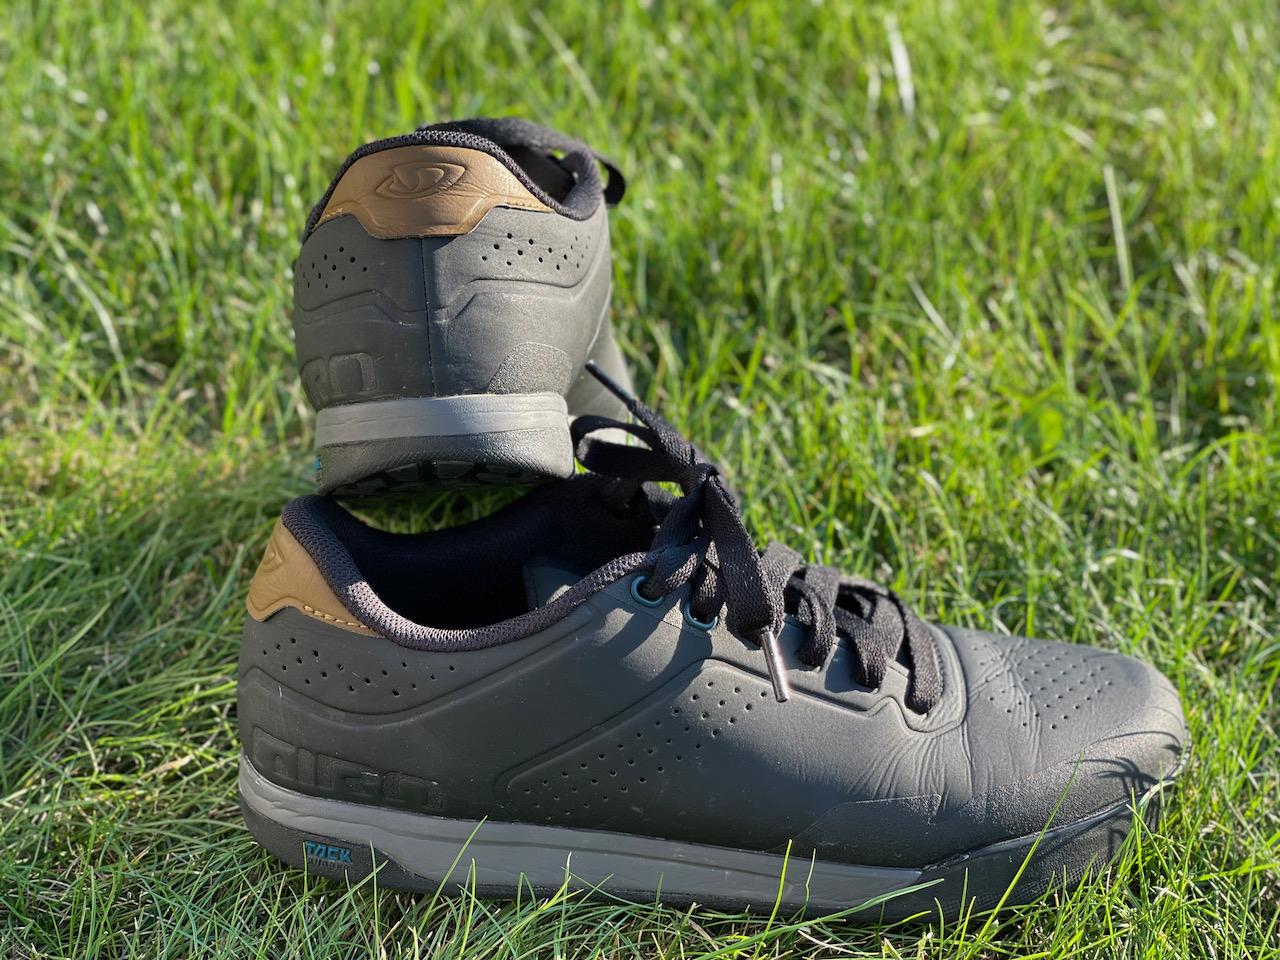 Giro Latch MTB shoes back